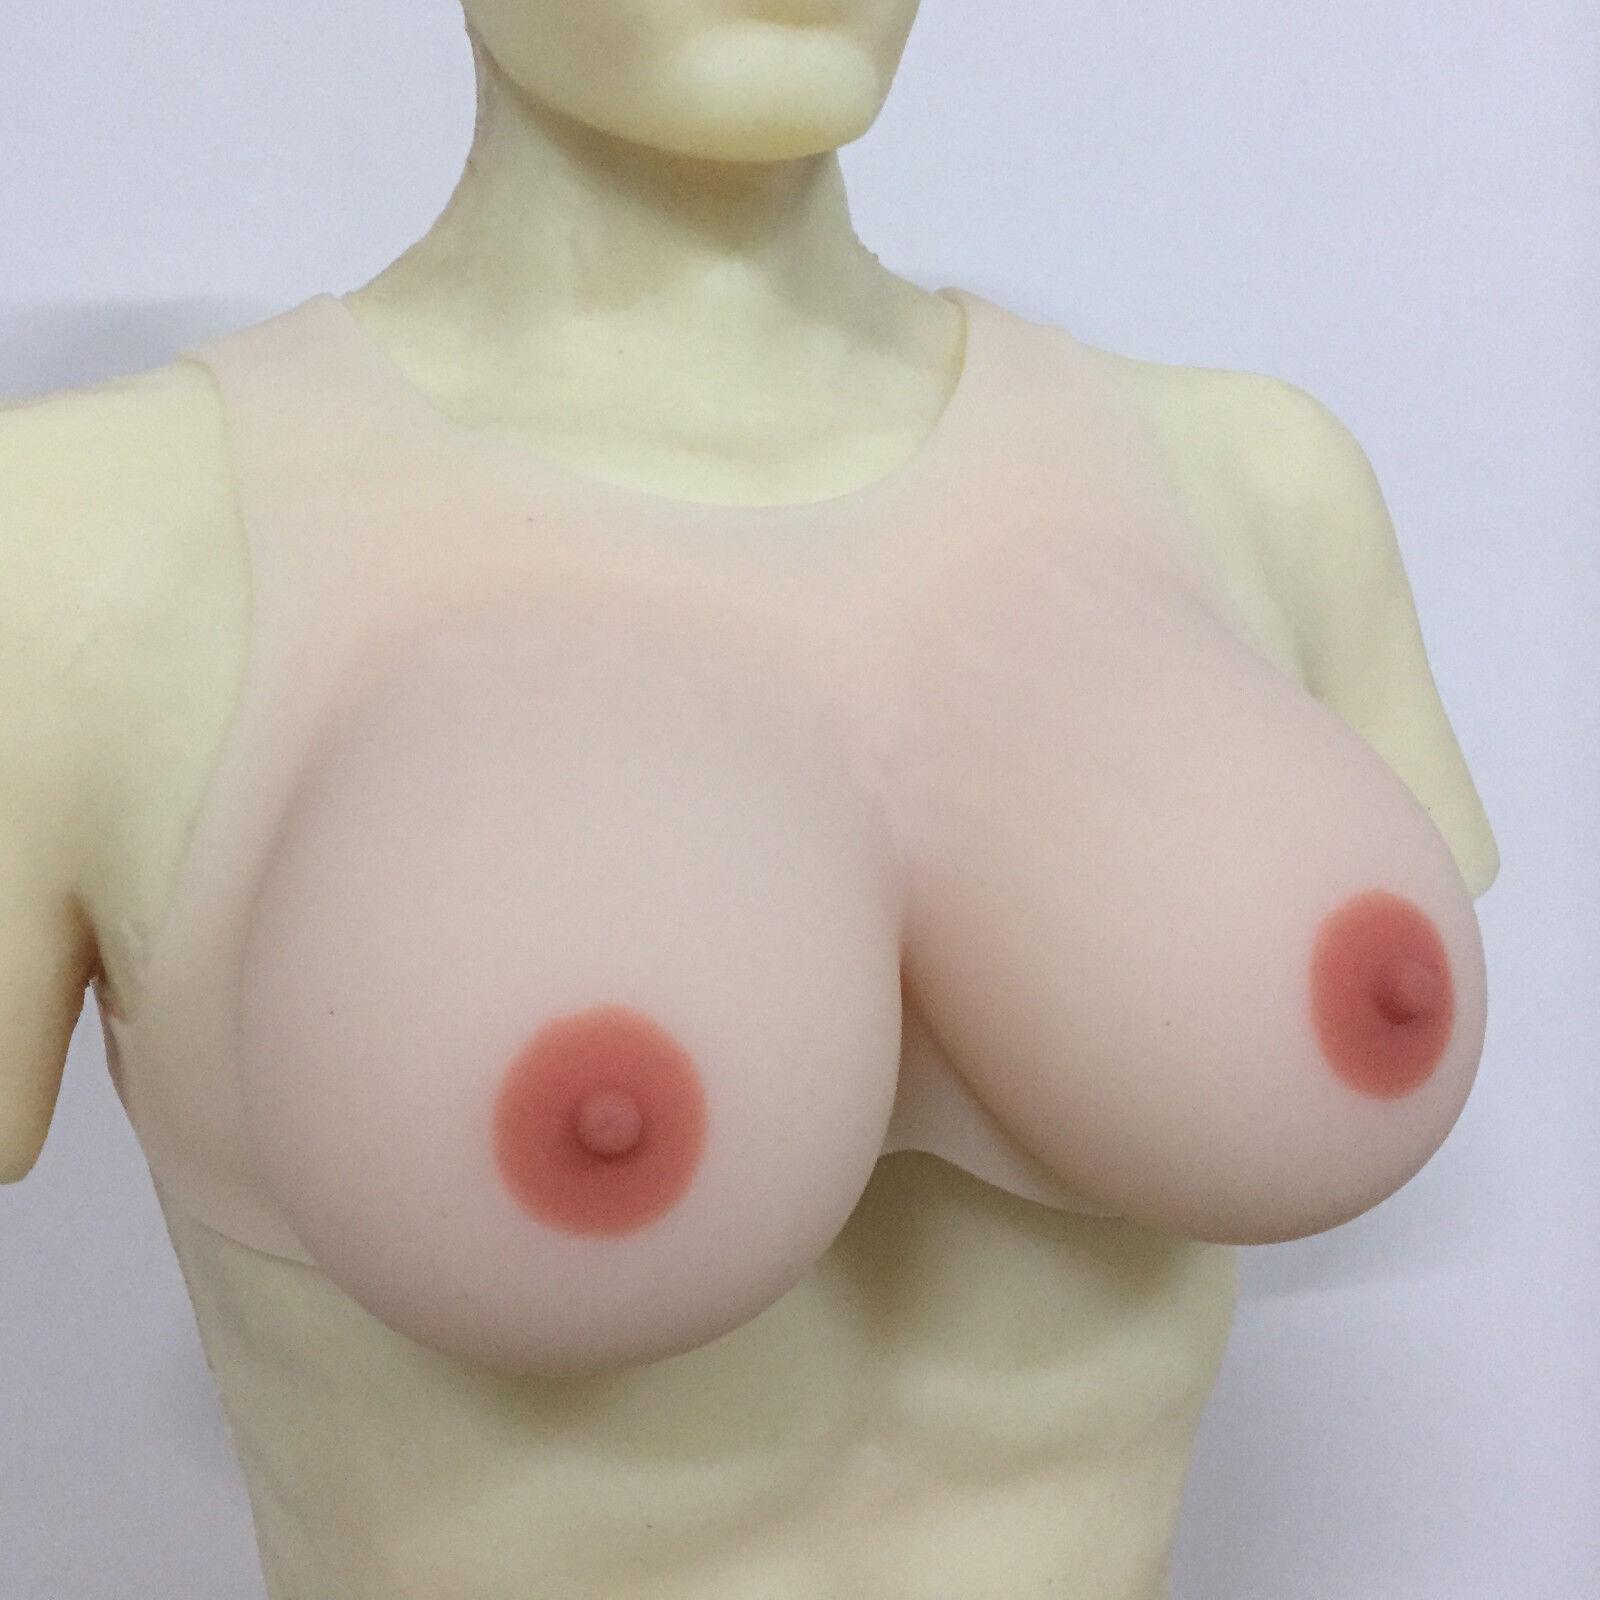 1600g Artificial Silicone Breast Form Transgender 4XL False Boobs Big Boobs